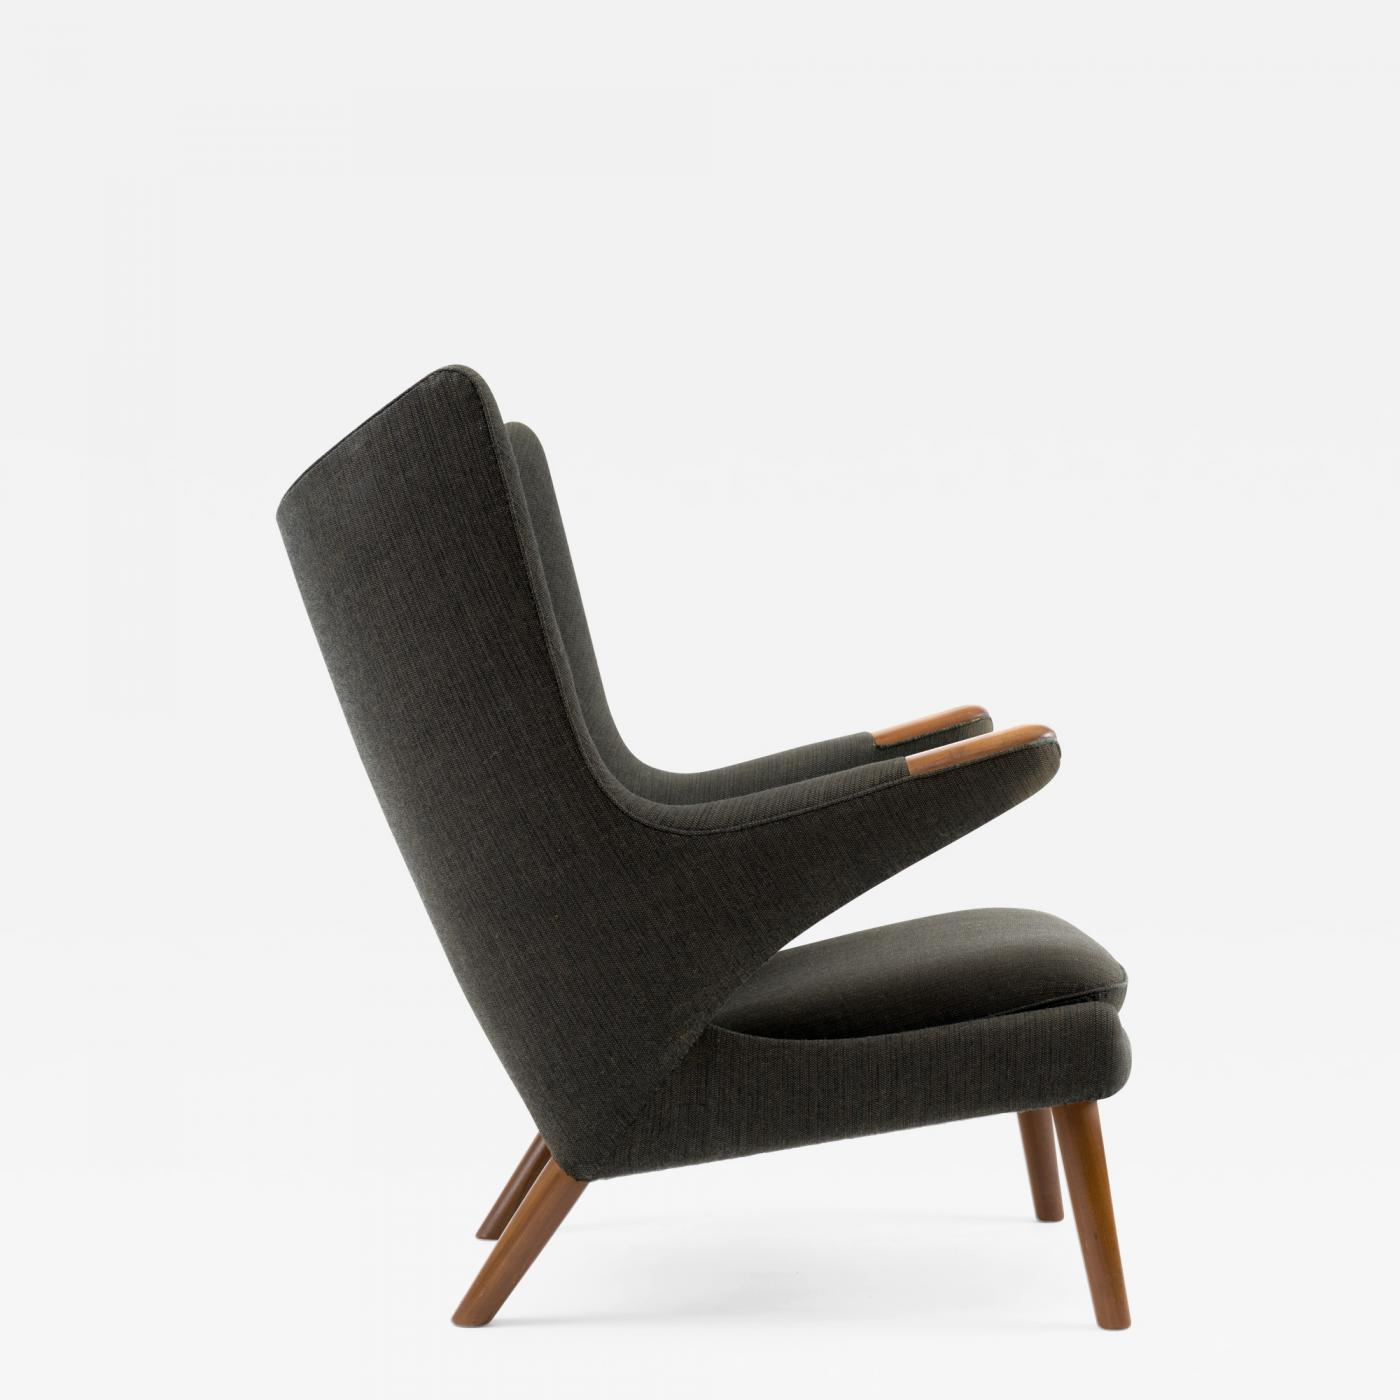 hans j wegner furniture. Listings / Furniture Seating Armchairs · Hans Wegner J